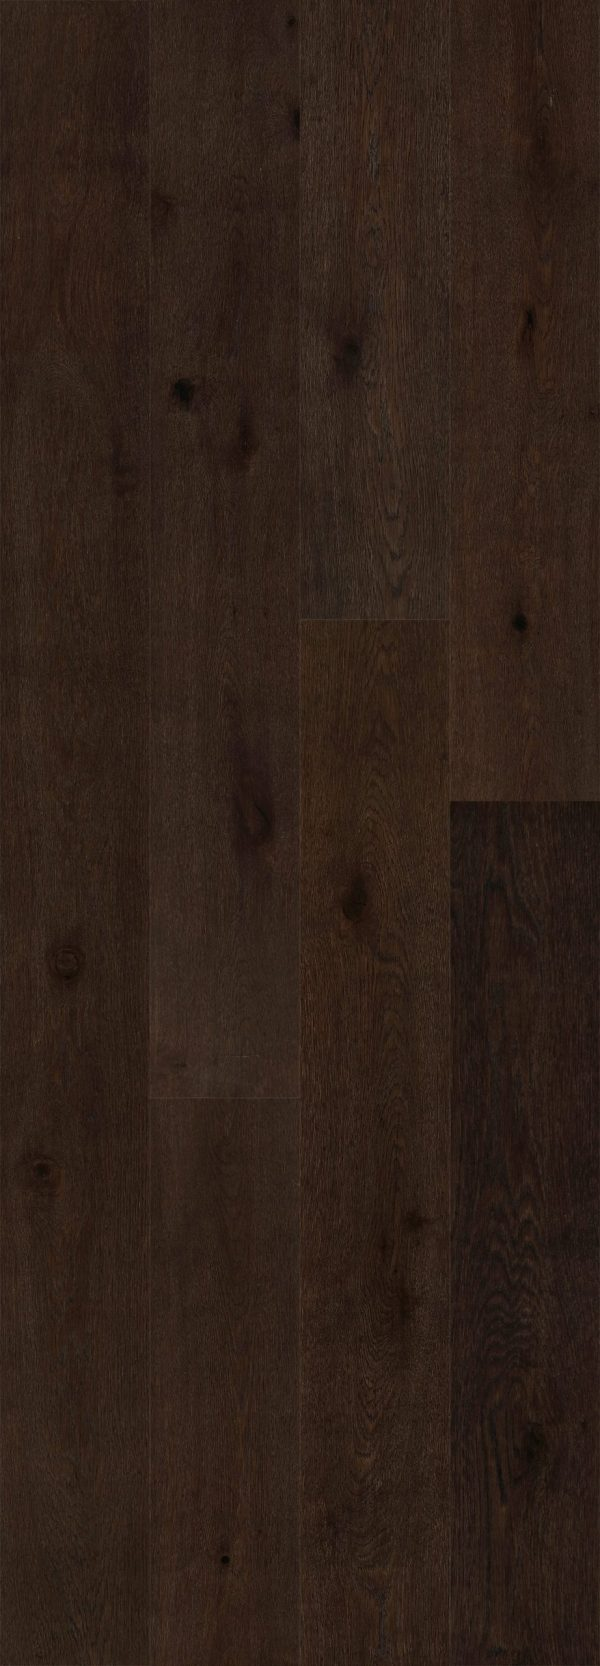 European Oak - Engineered Hardwood - Wire Brushed - CF1021729